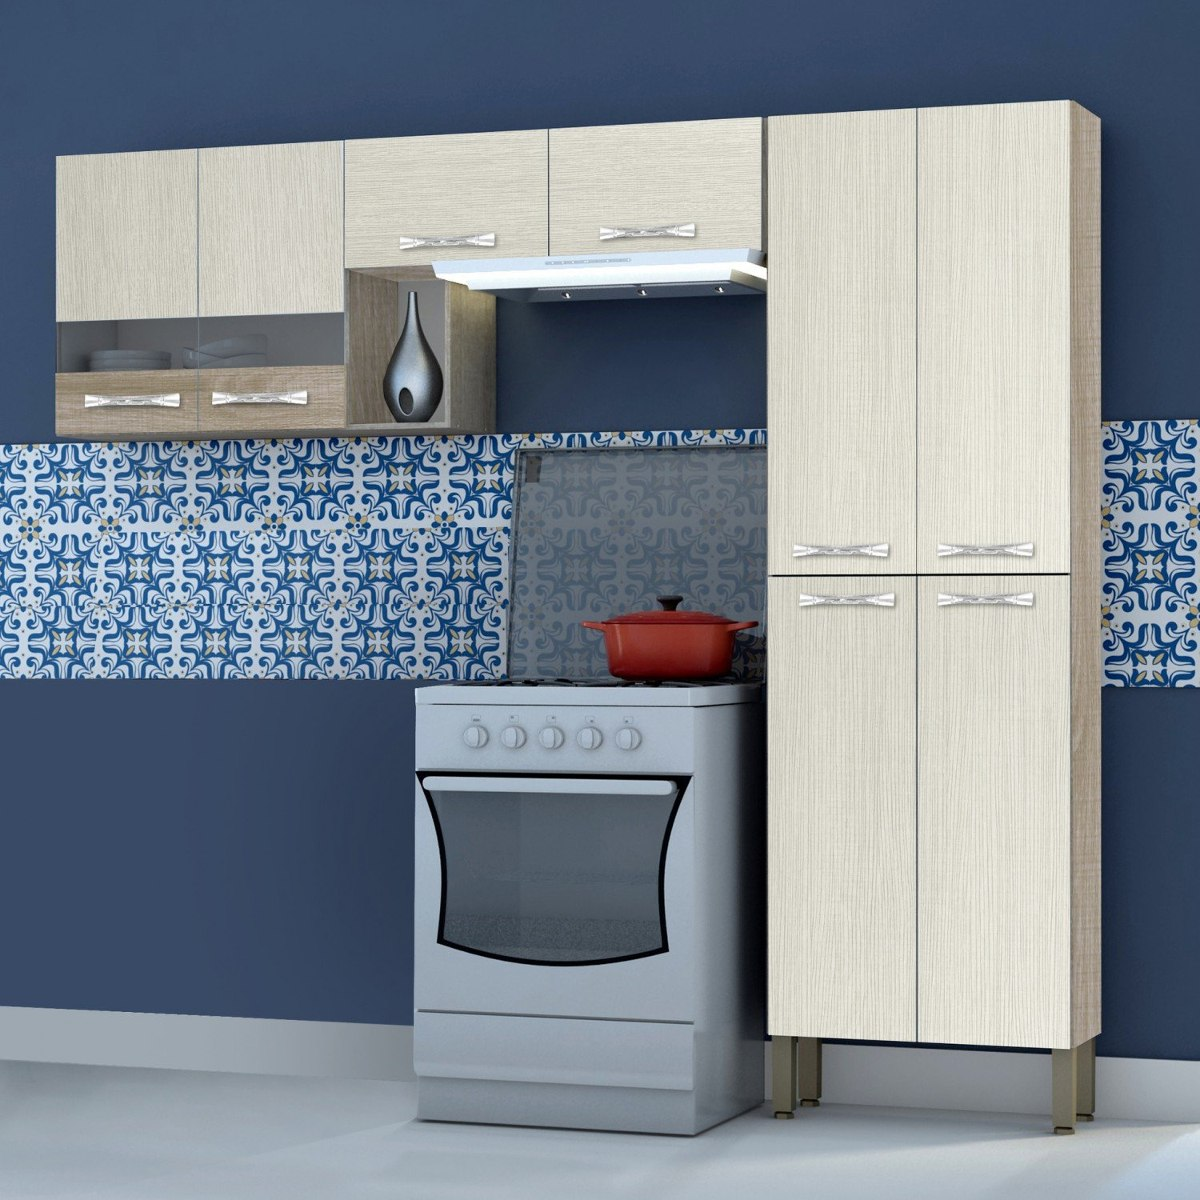 Cozinha Compacta 3 Pe As Mega Kits Paran Gc R 359 90 Em Mercado